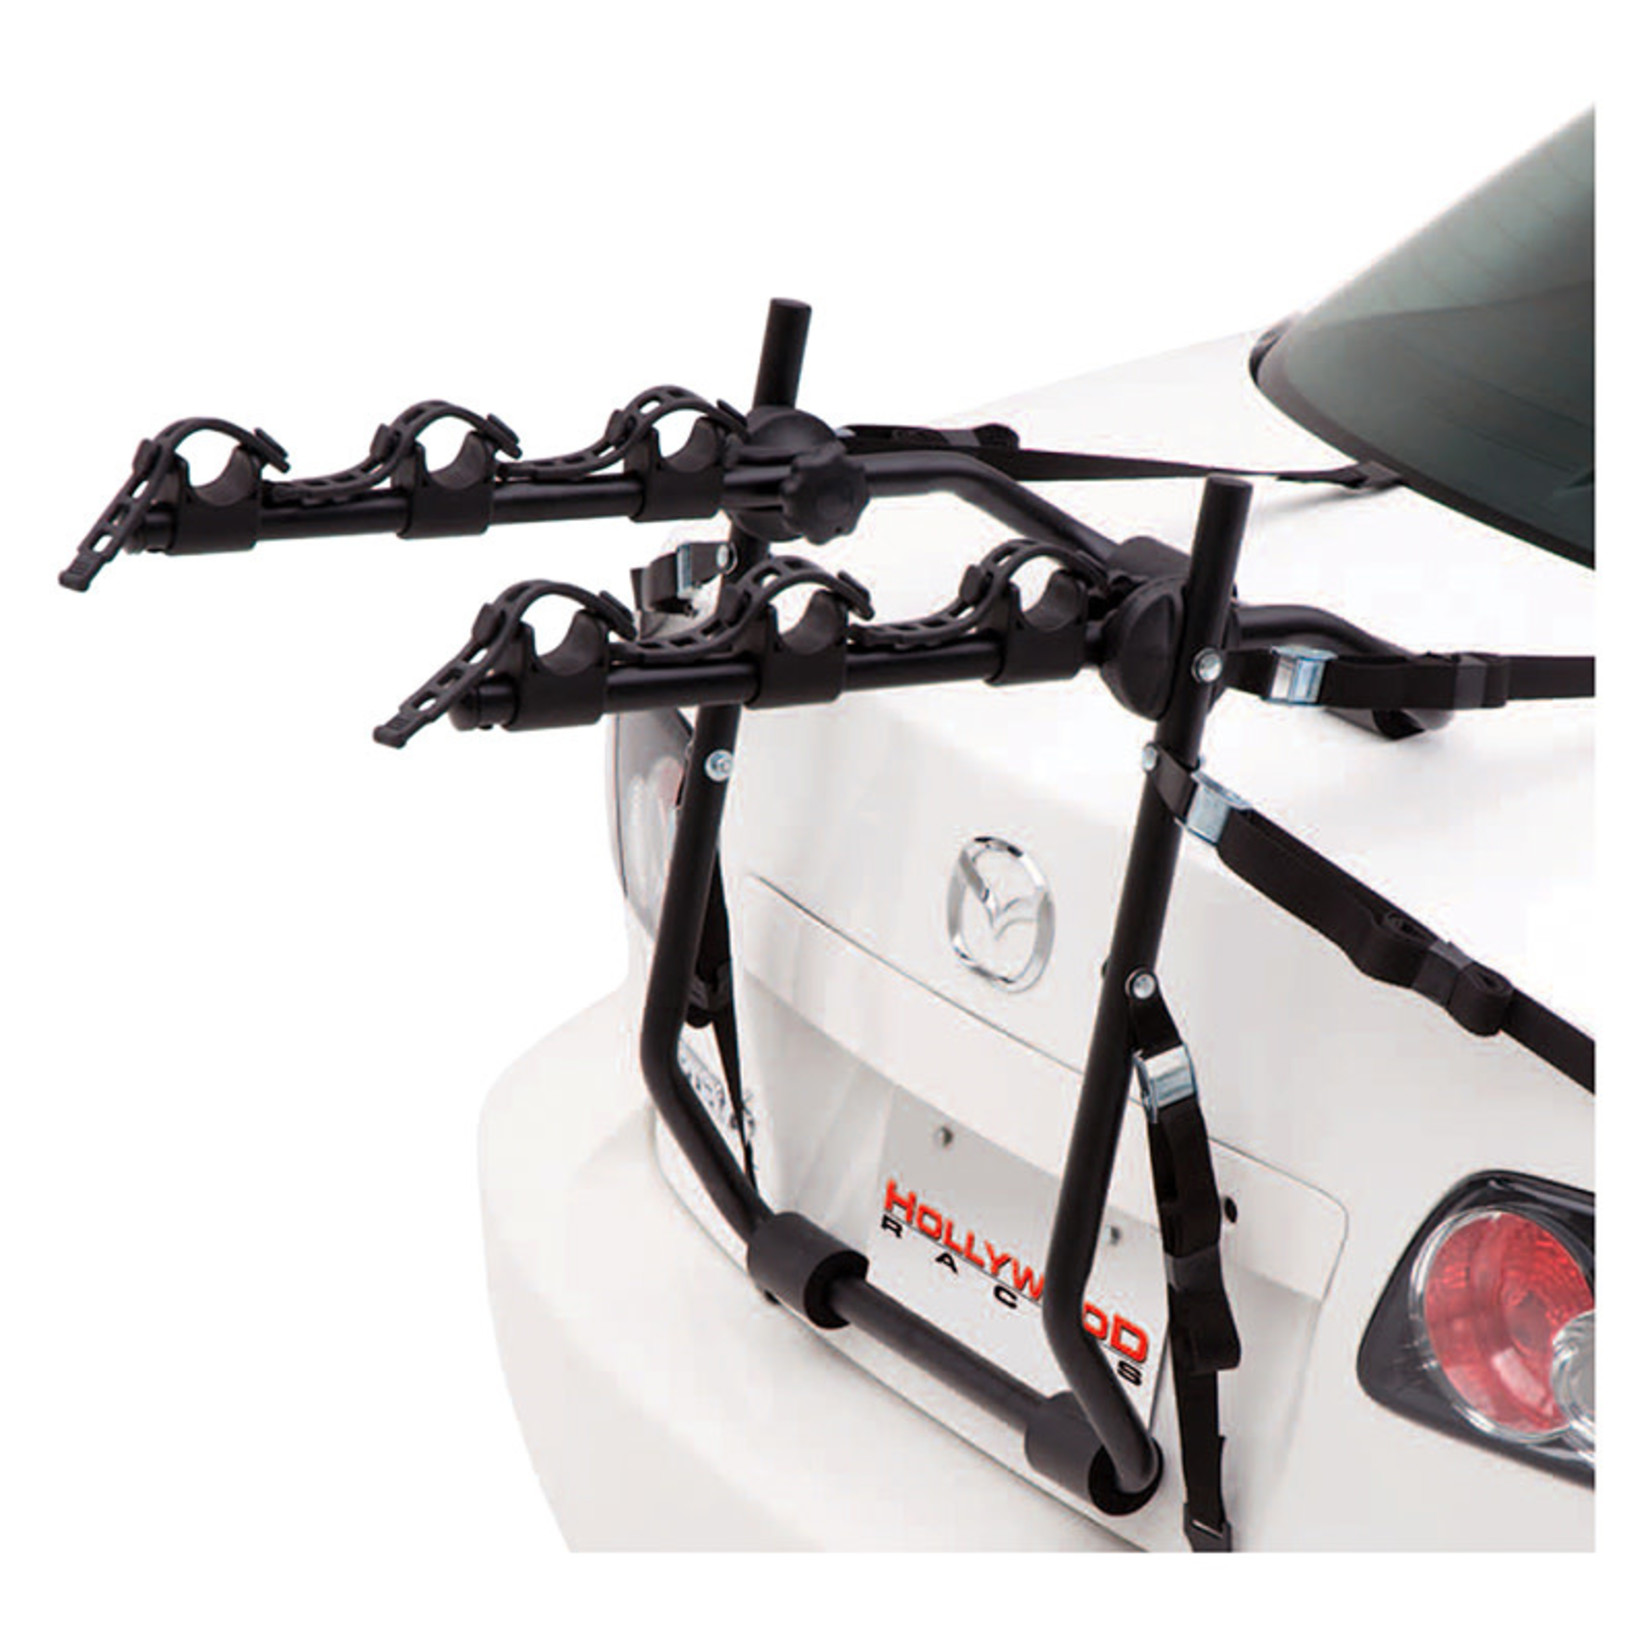 Hollywood Express Trunk Rack - 3-Bike